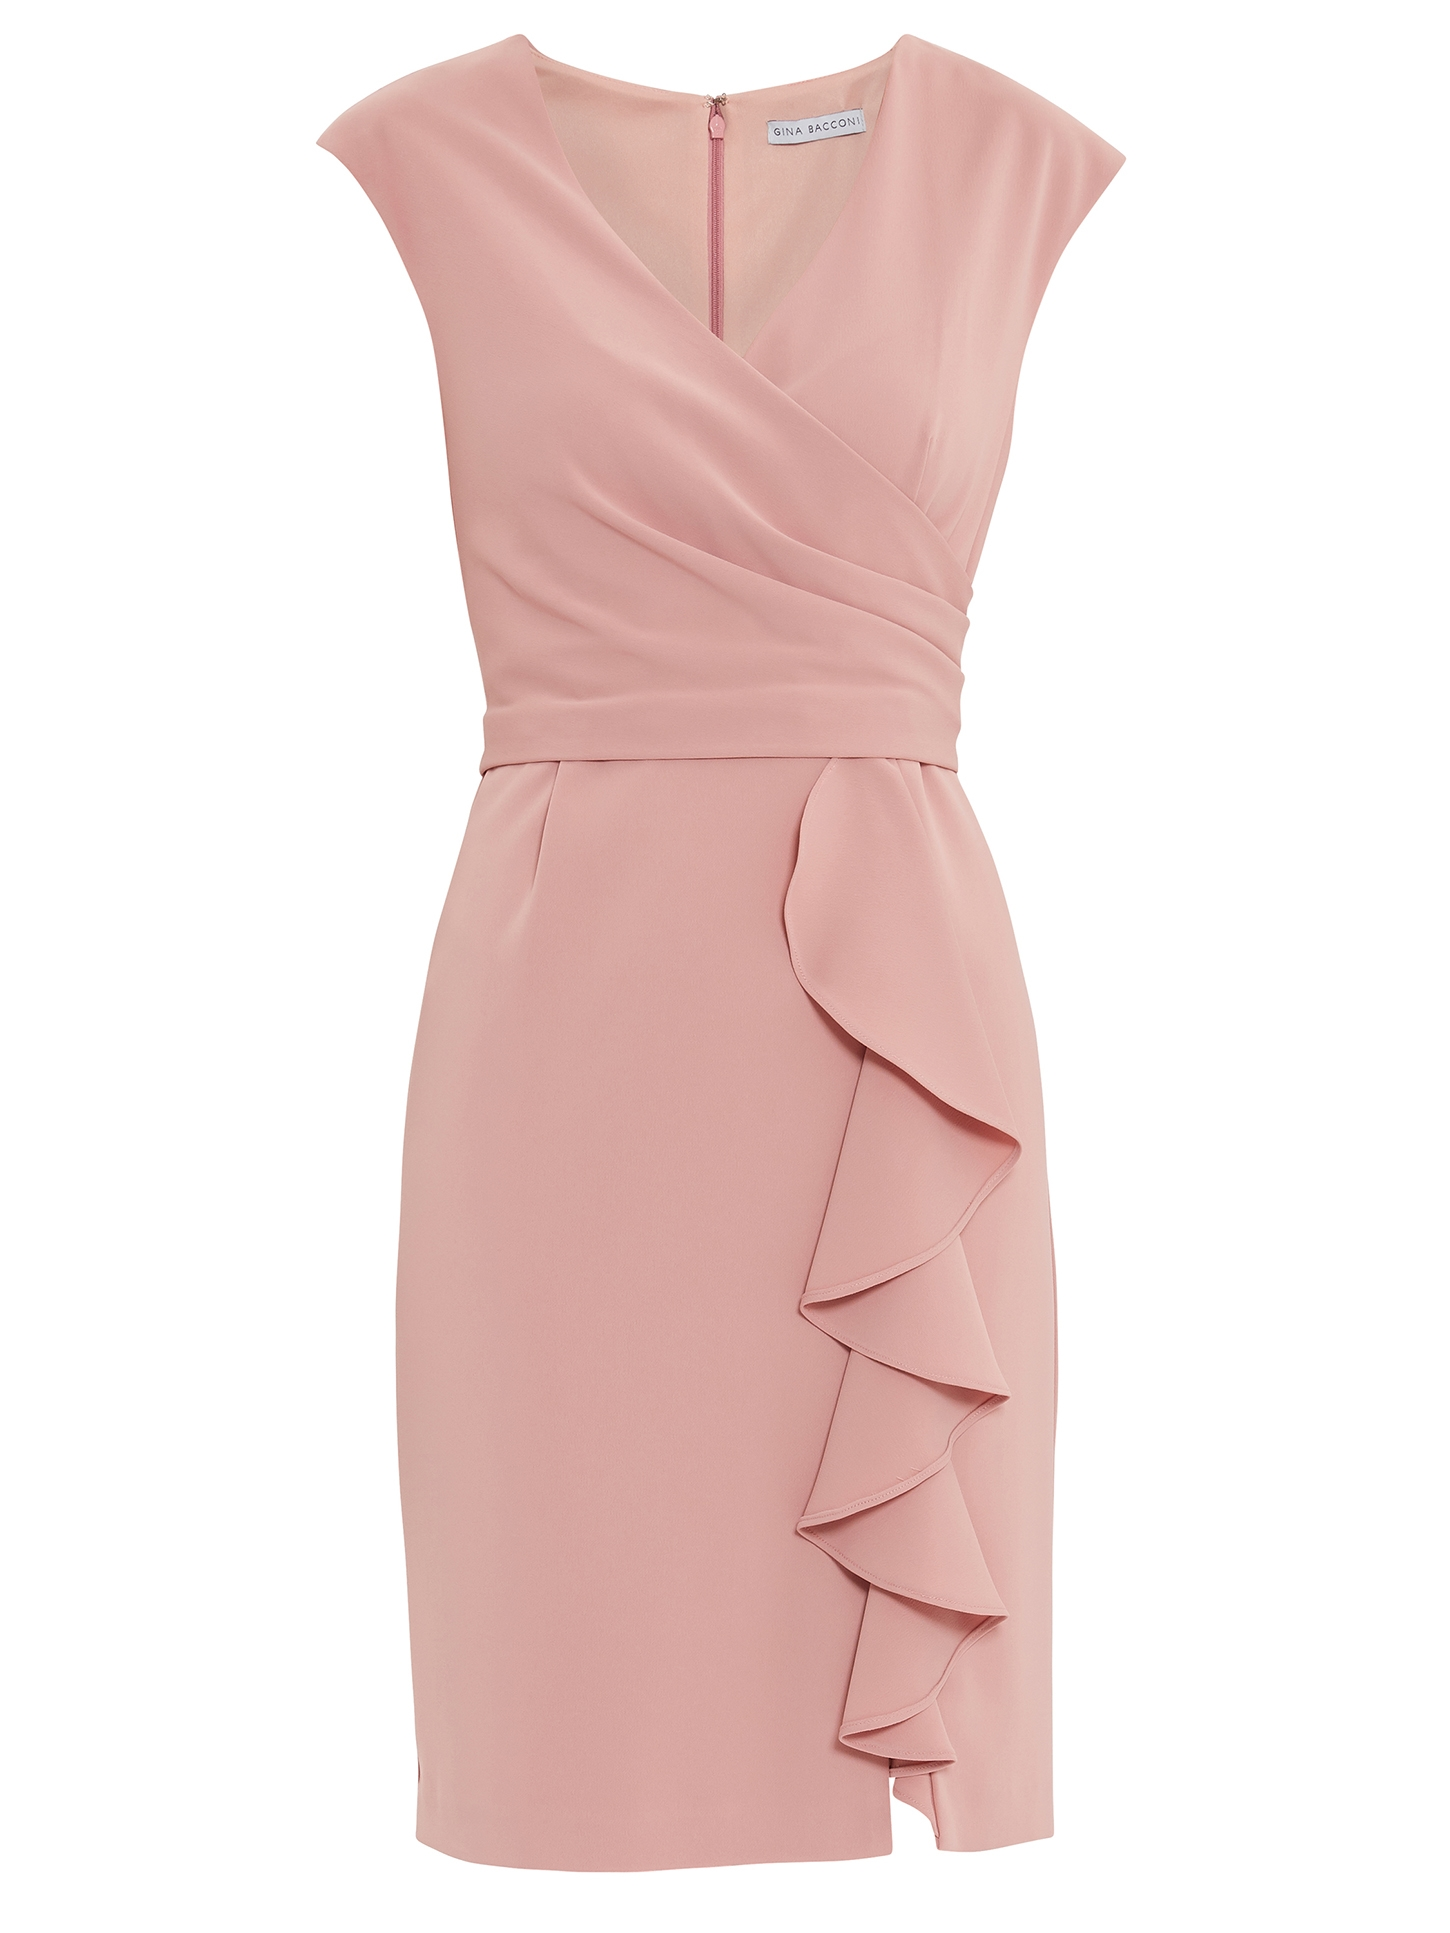 Inona Moss Crepe Dress